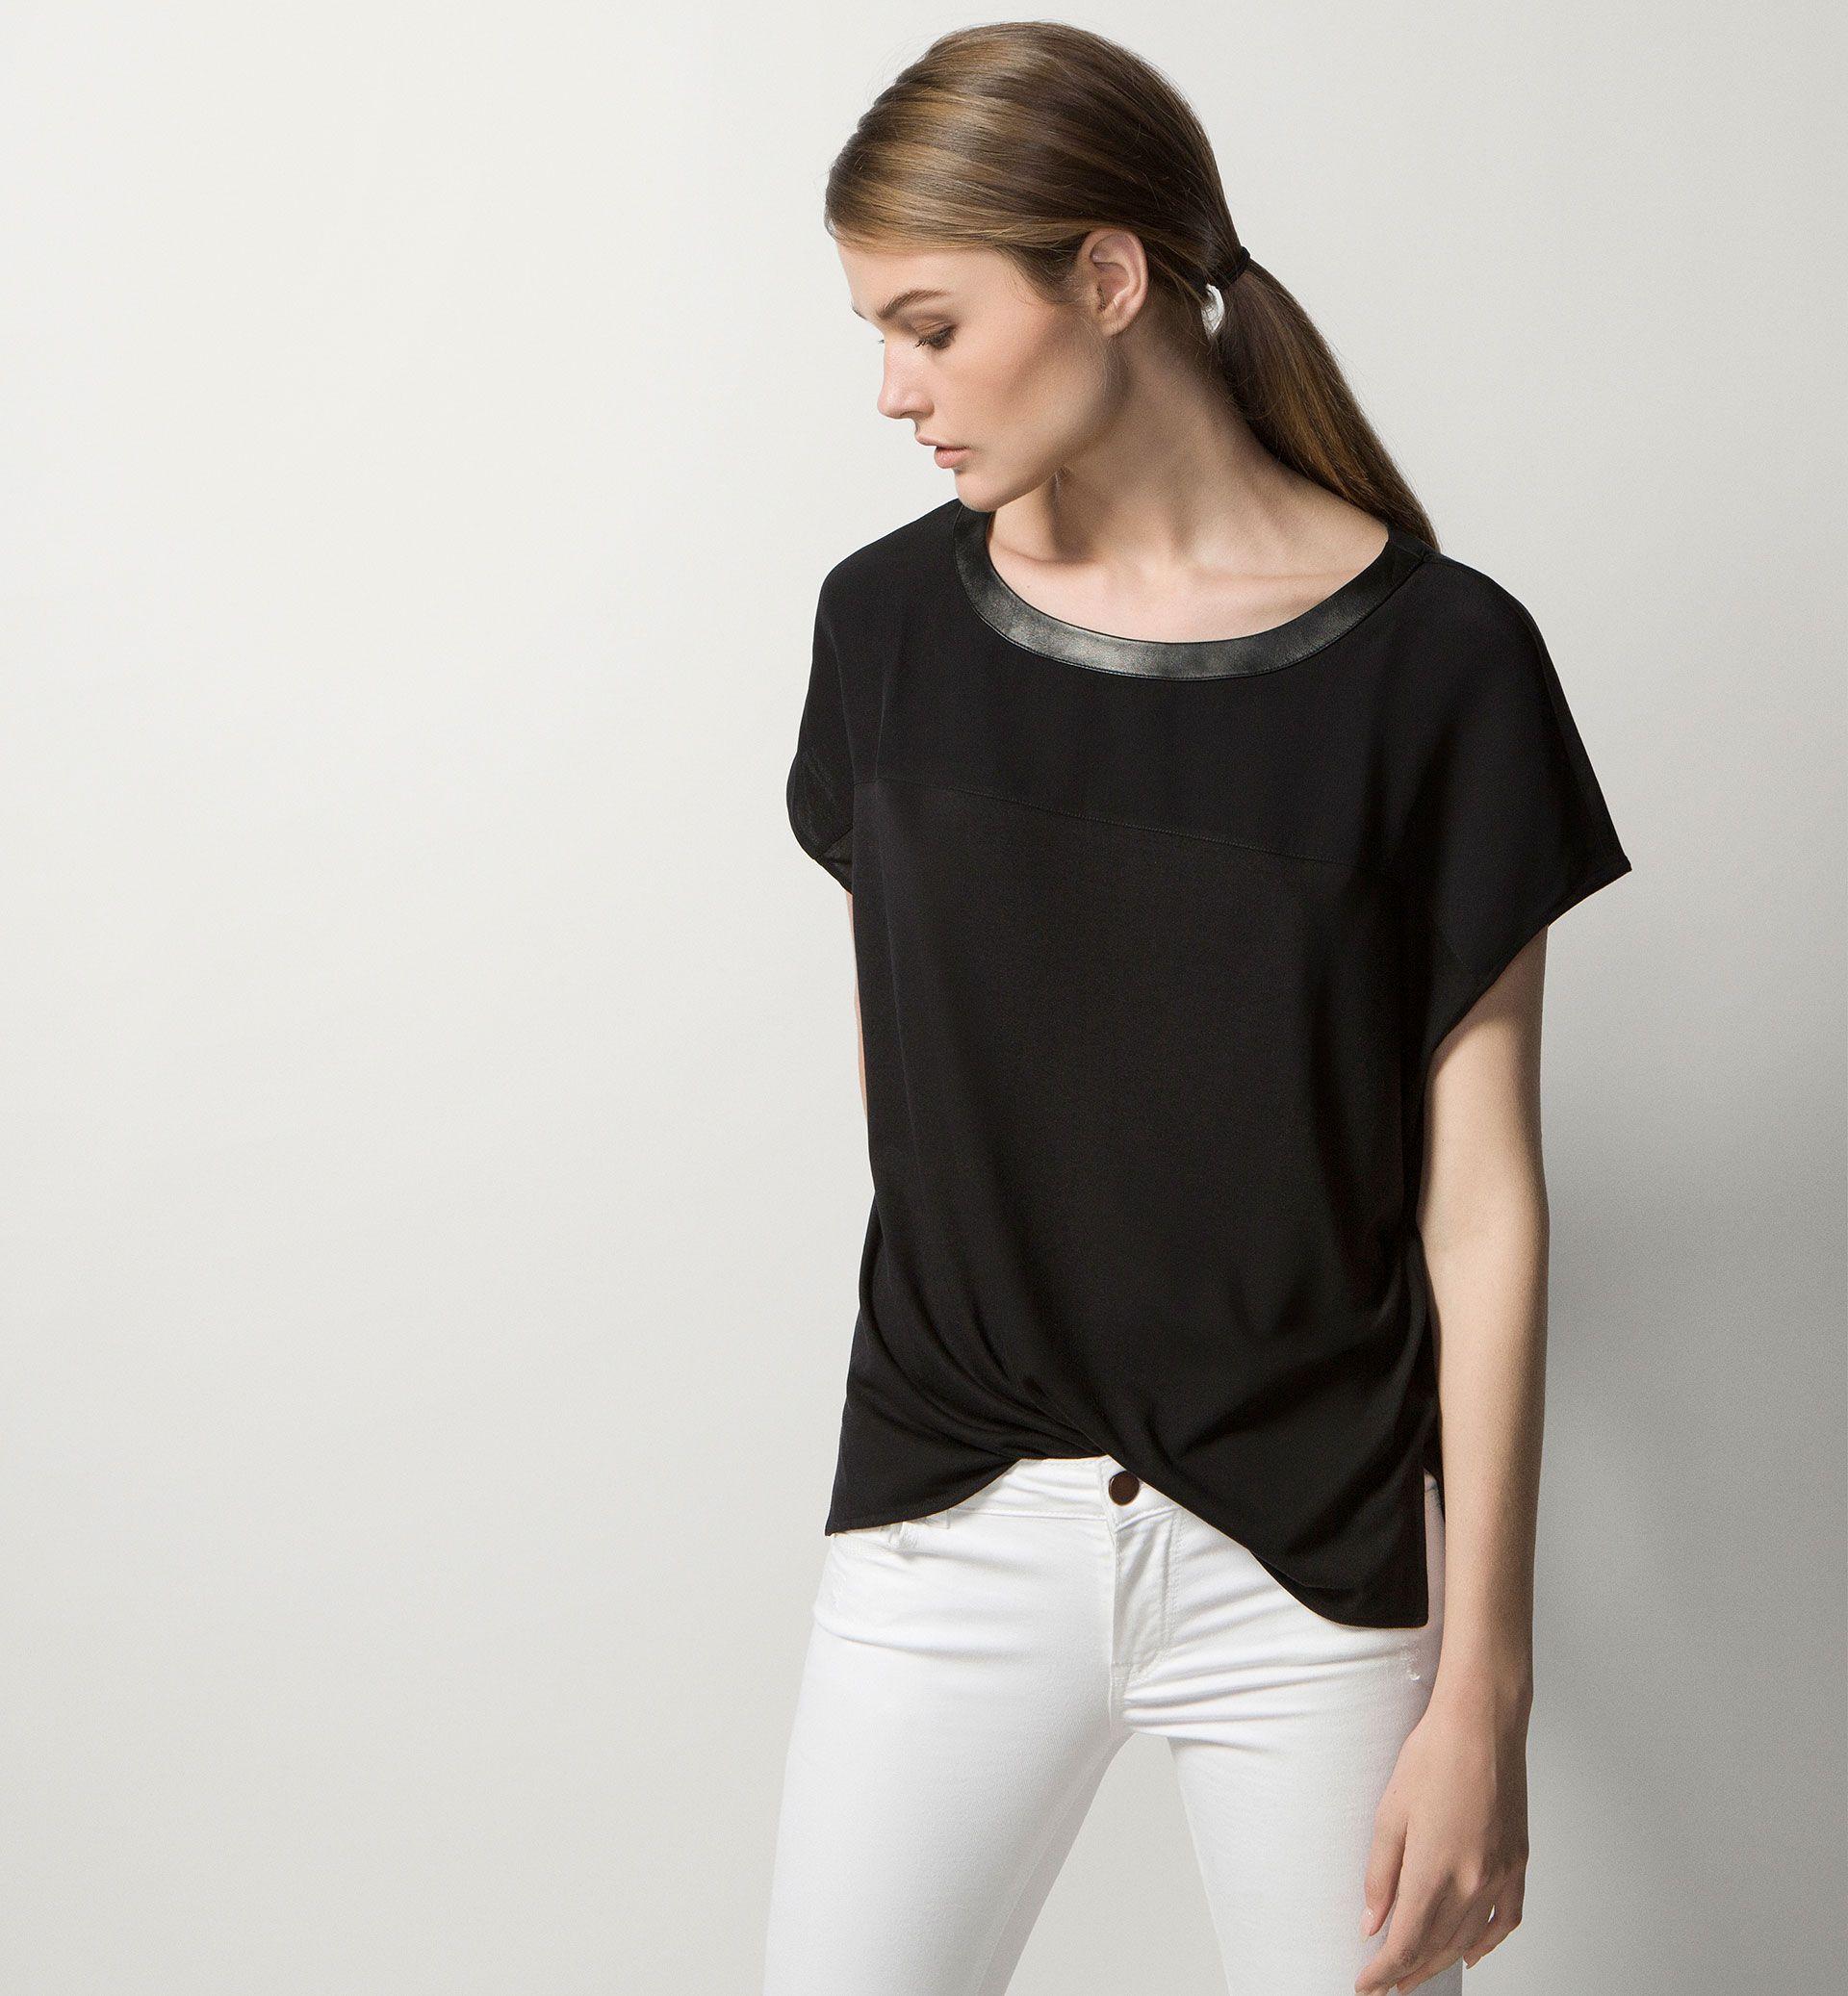 TOP WITH LEATHER NECKLINE - Business Wear - T-shirts - WOMEN - Austria -